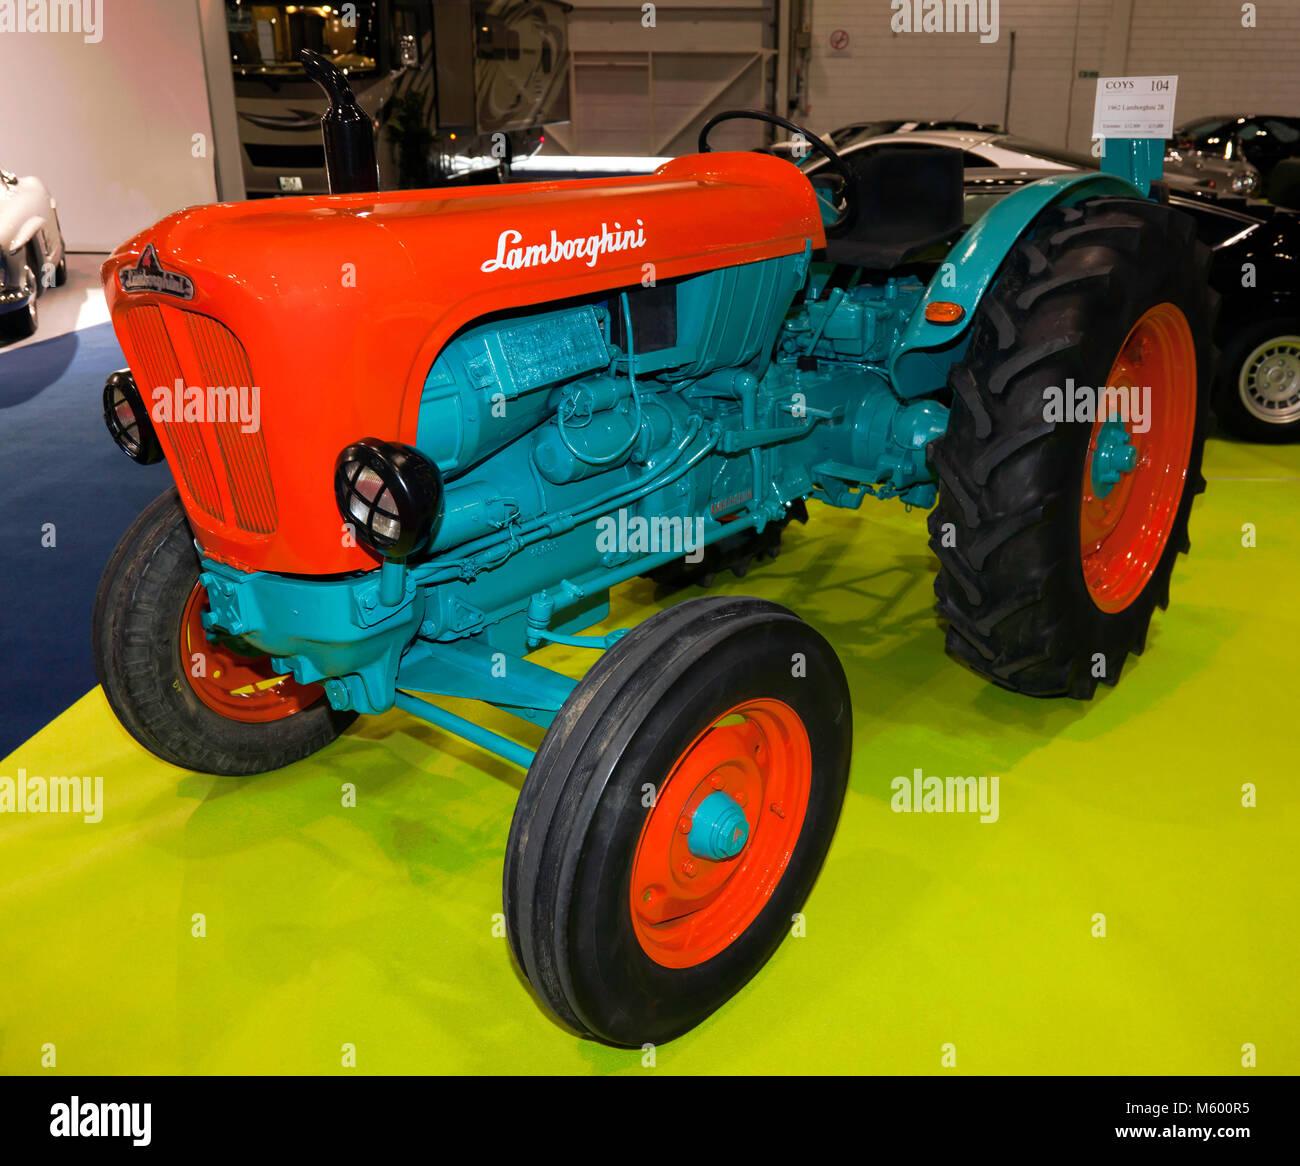 Lamborghini Tractor Stock Photos & Lamborghini Tractor Stock